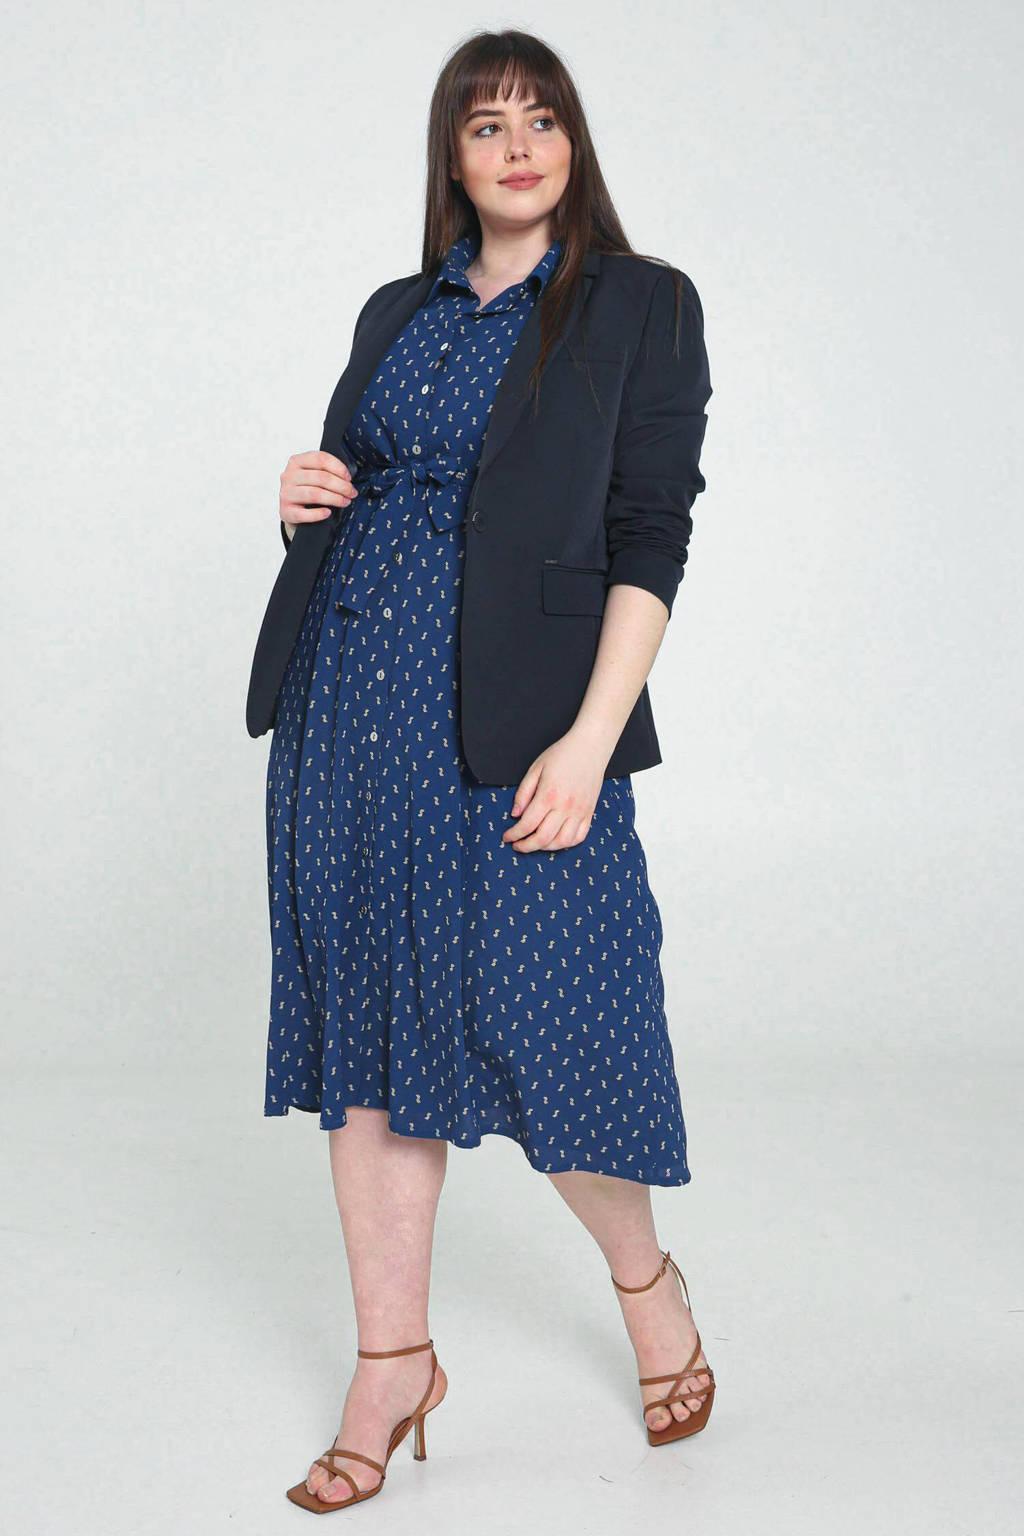 PROMISS mouwloze midi-jurk donkerblauw/geel/wit, Donkerblauw/geel/wit